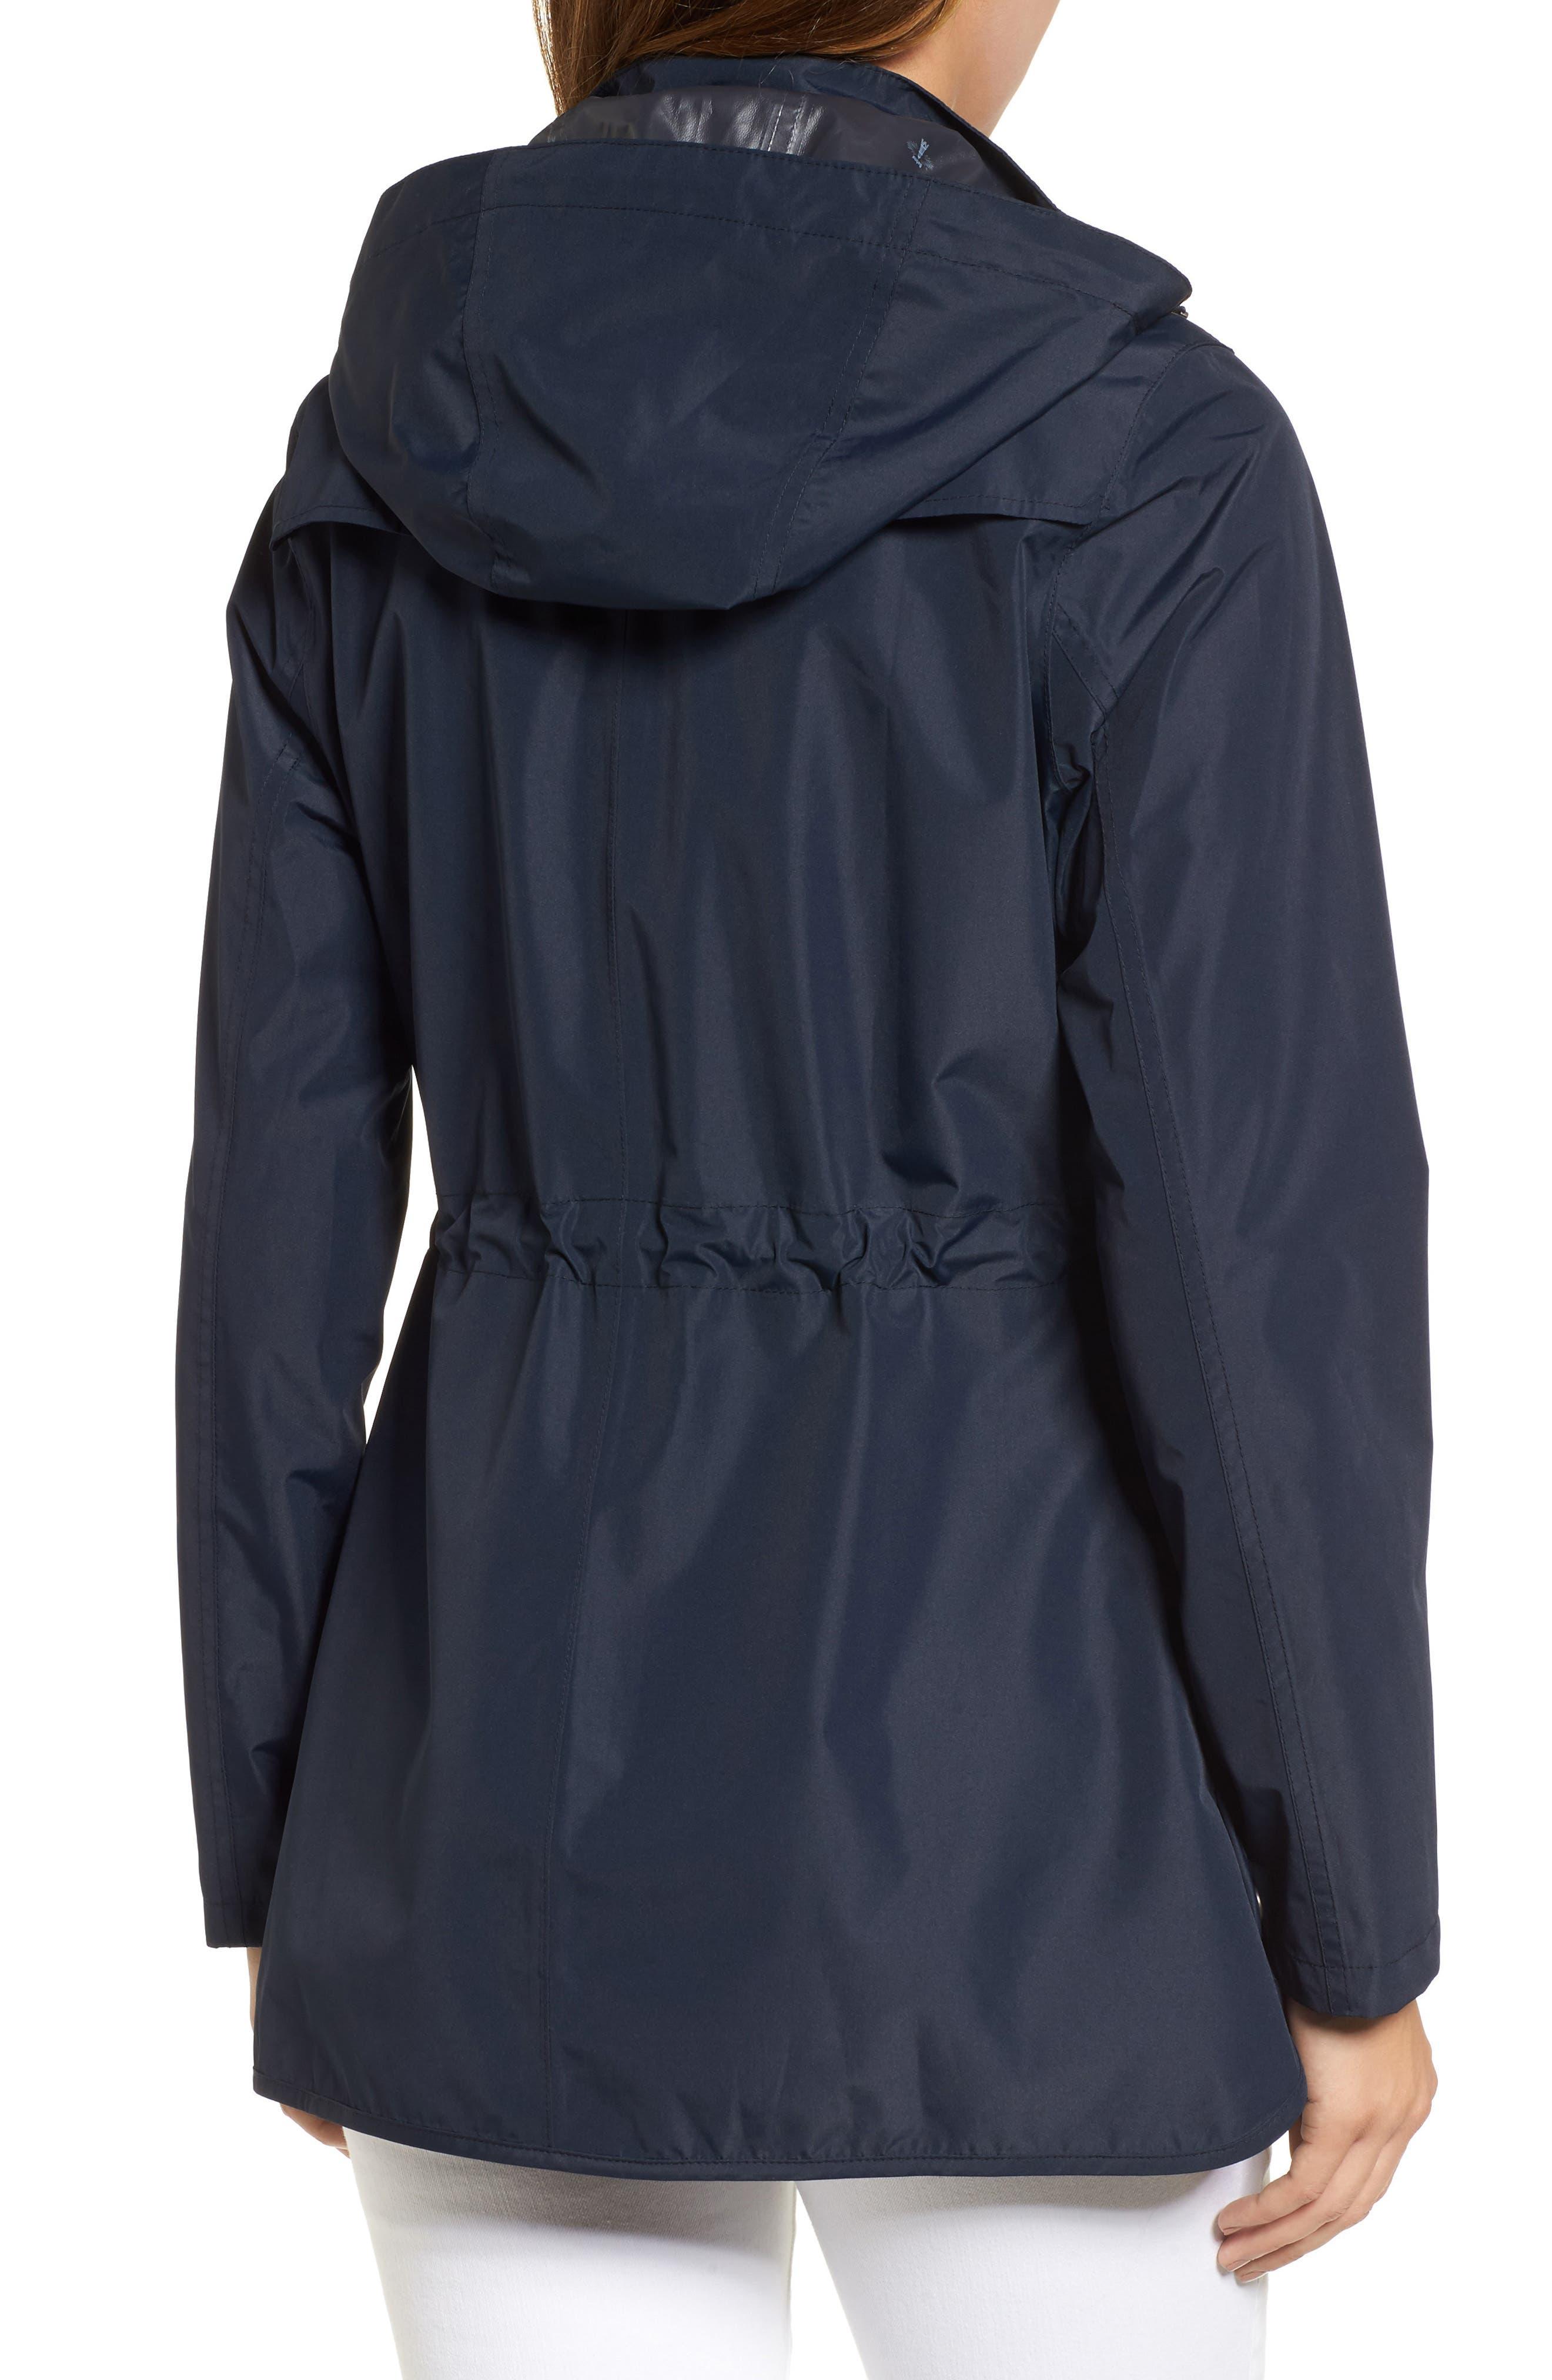 Studland Waterproof Jacket,                             Alternate thumbnail 2, color,                             Navy